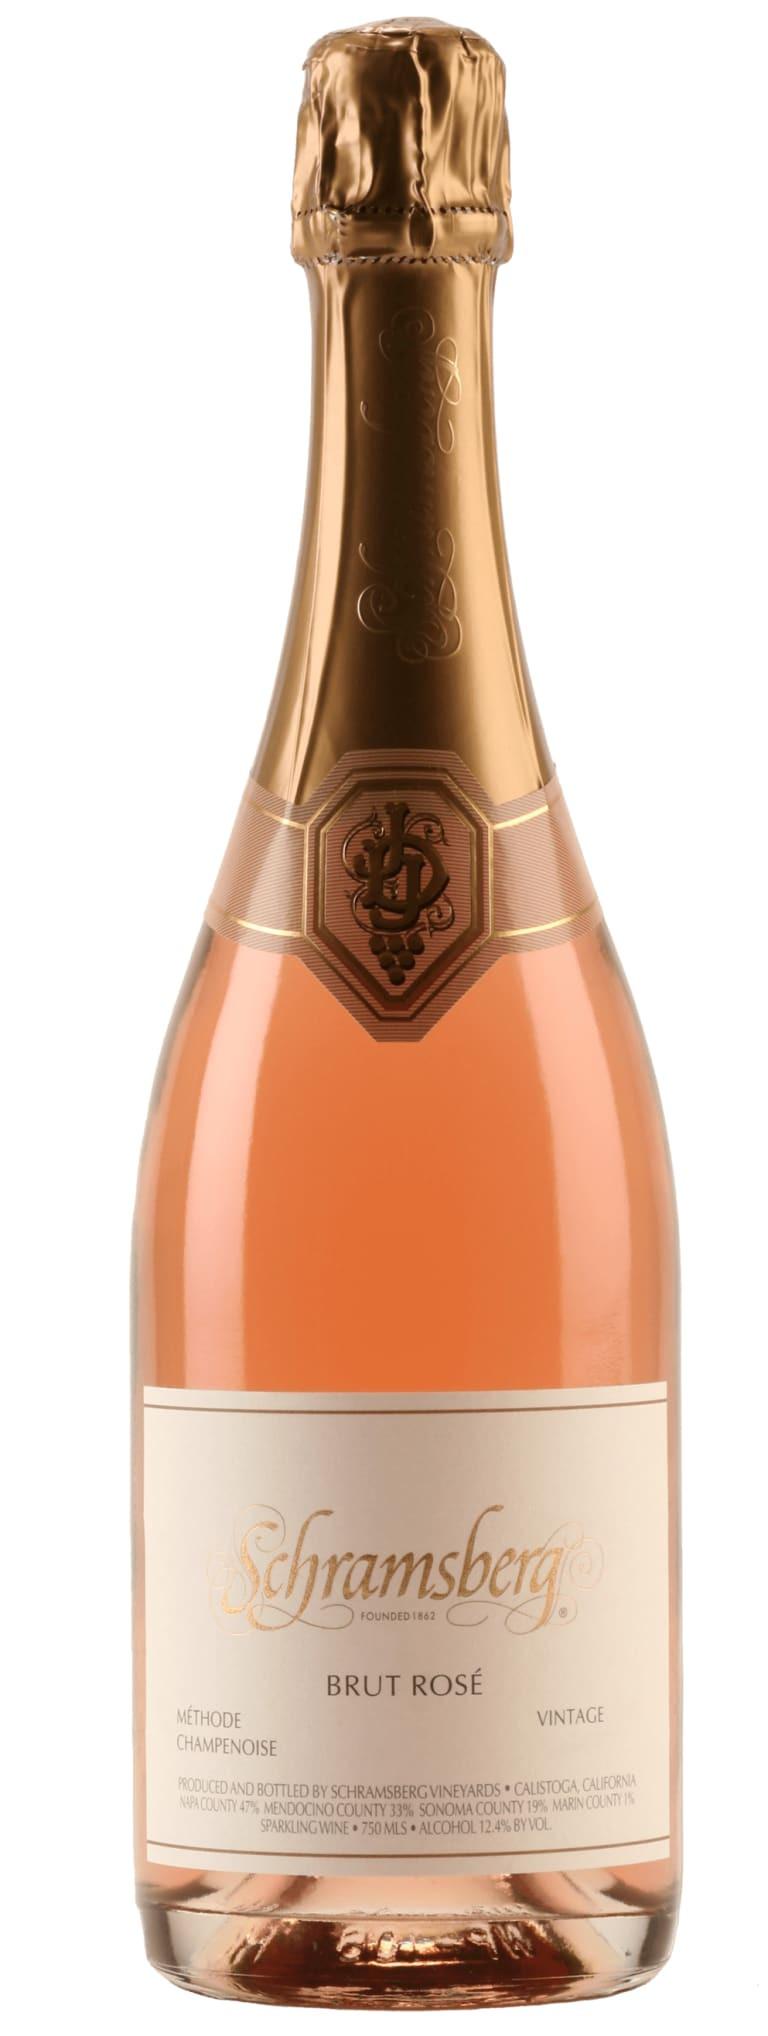 2017 Schramsberg Brut Rose 750ml